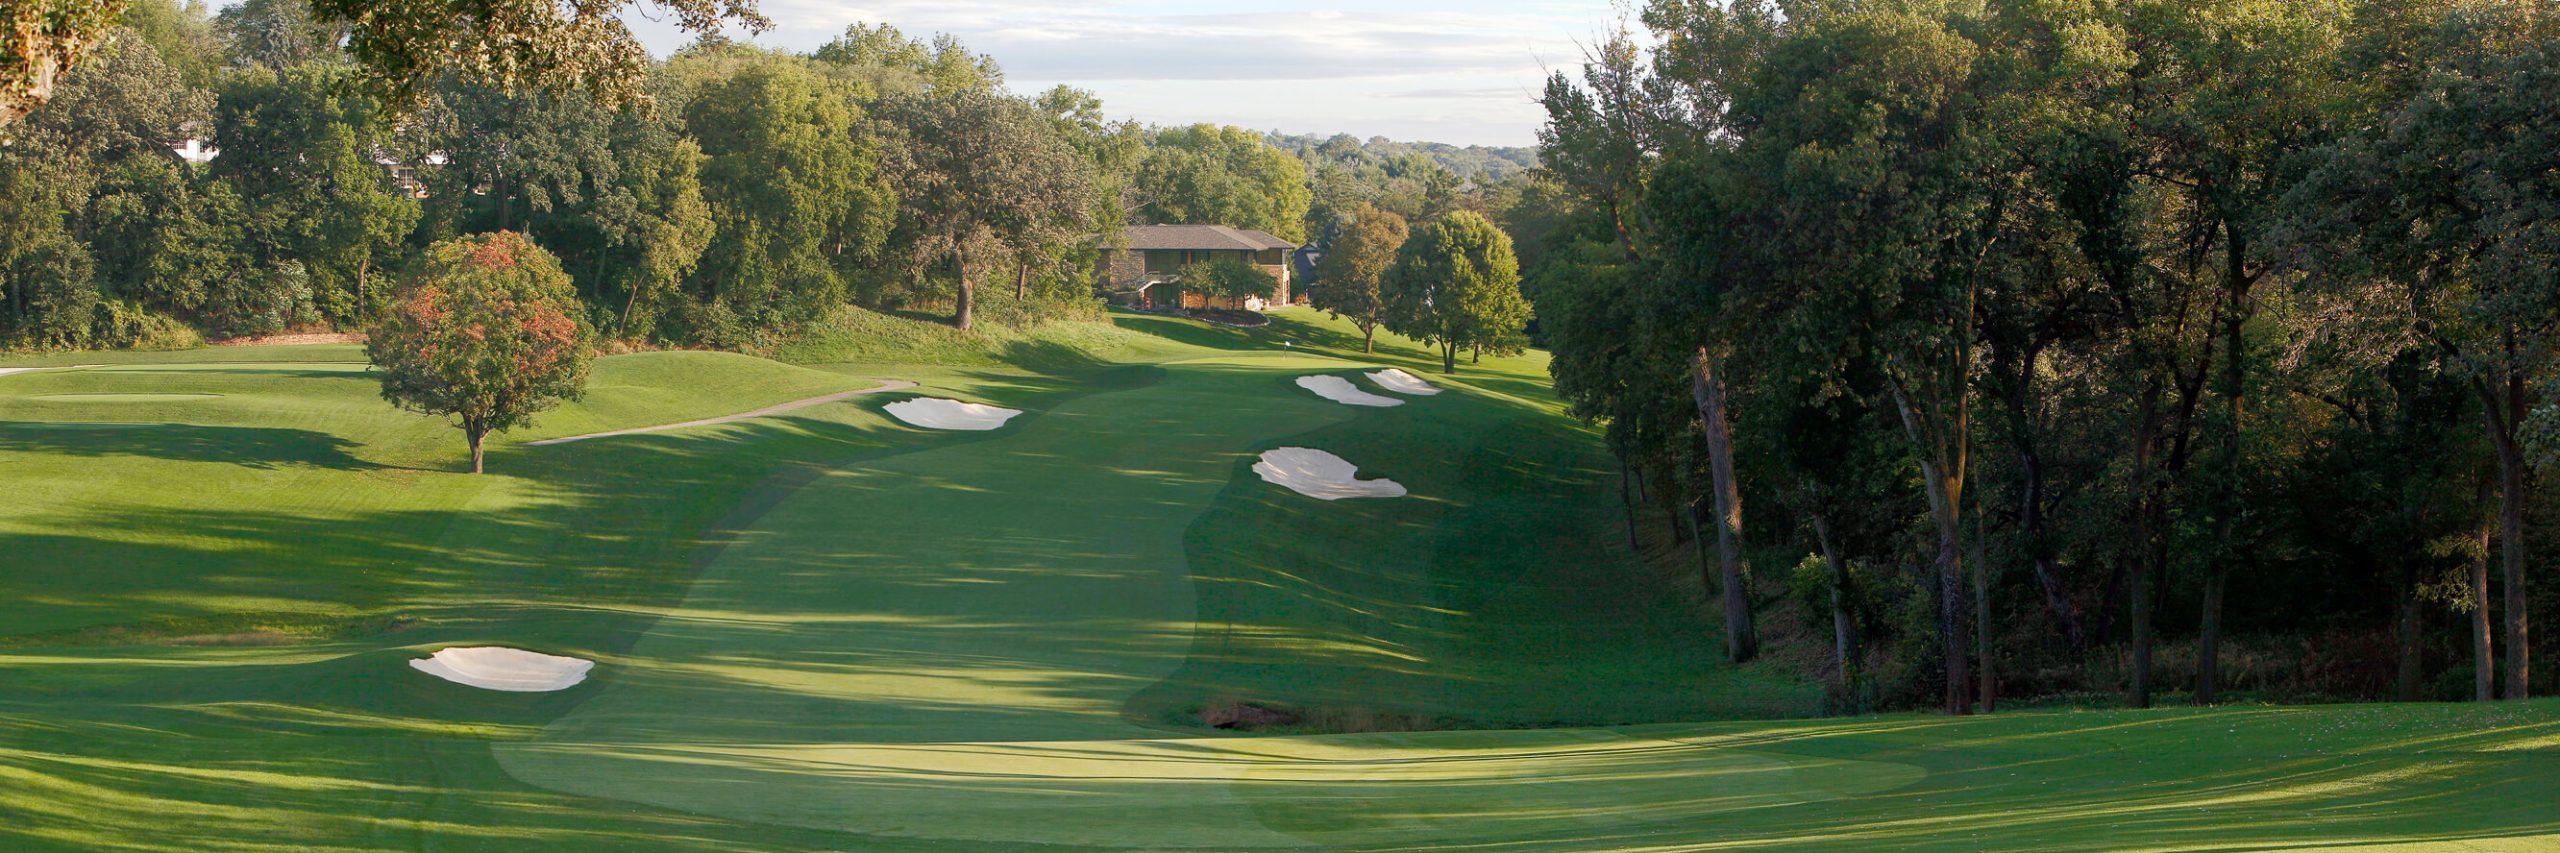 Golf Course Image - Omaha Country Club No. 10B